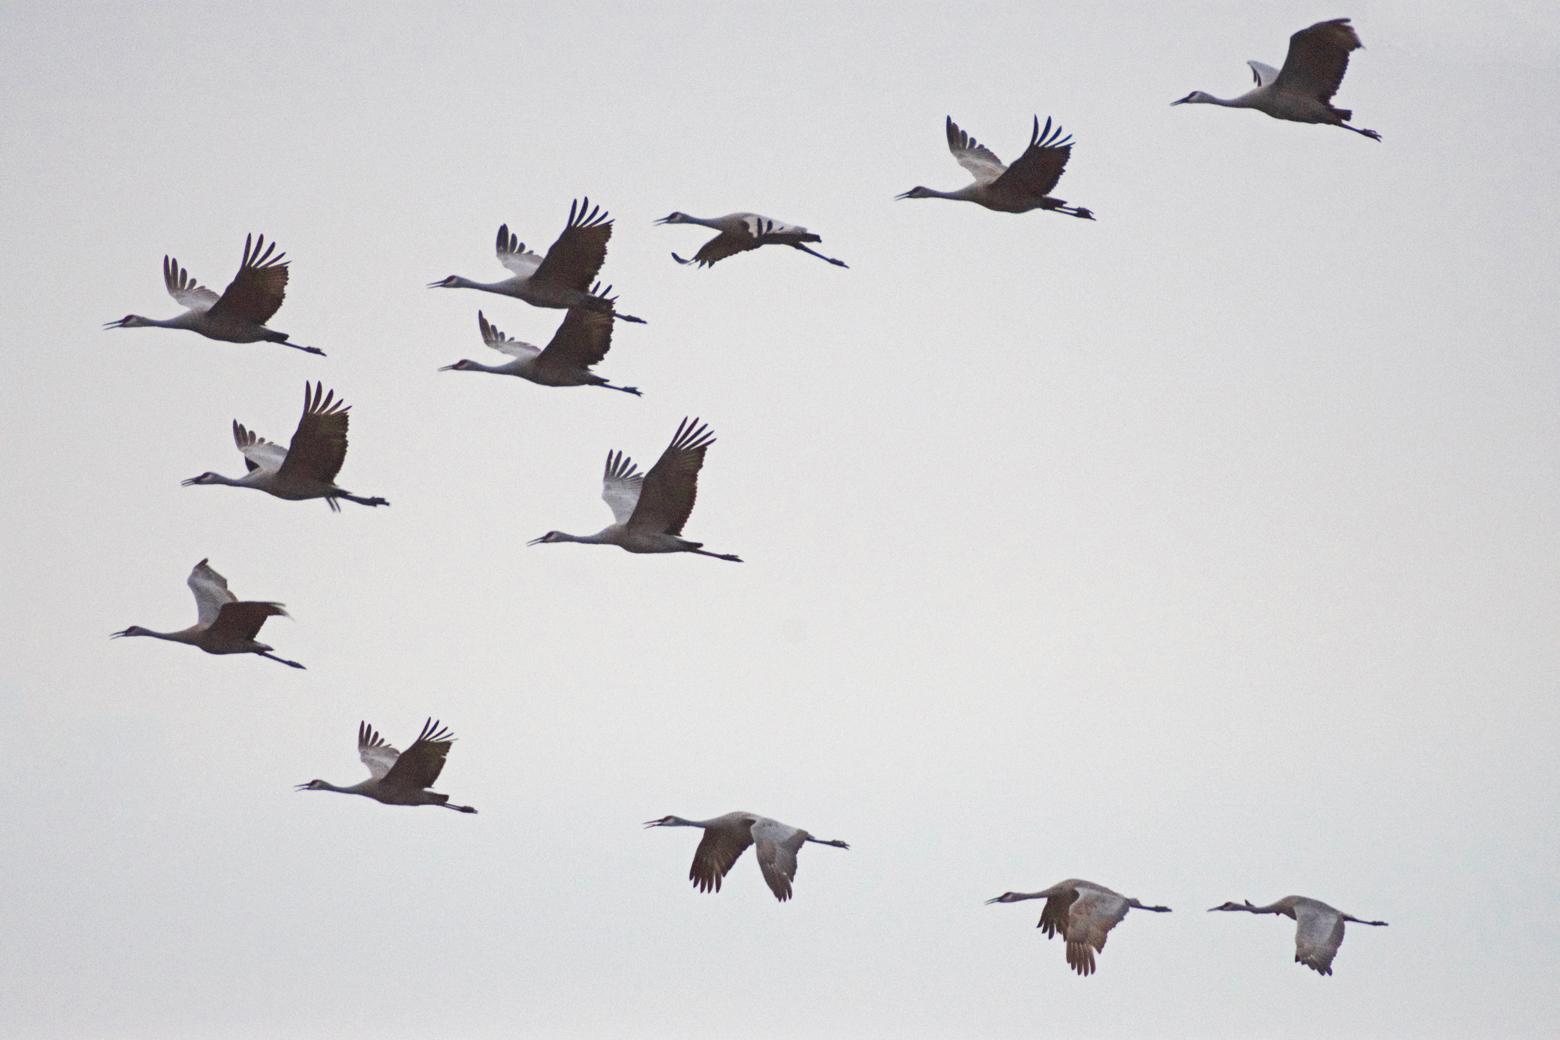 Flock of sandhill cranes flying at Cibola